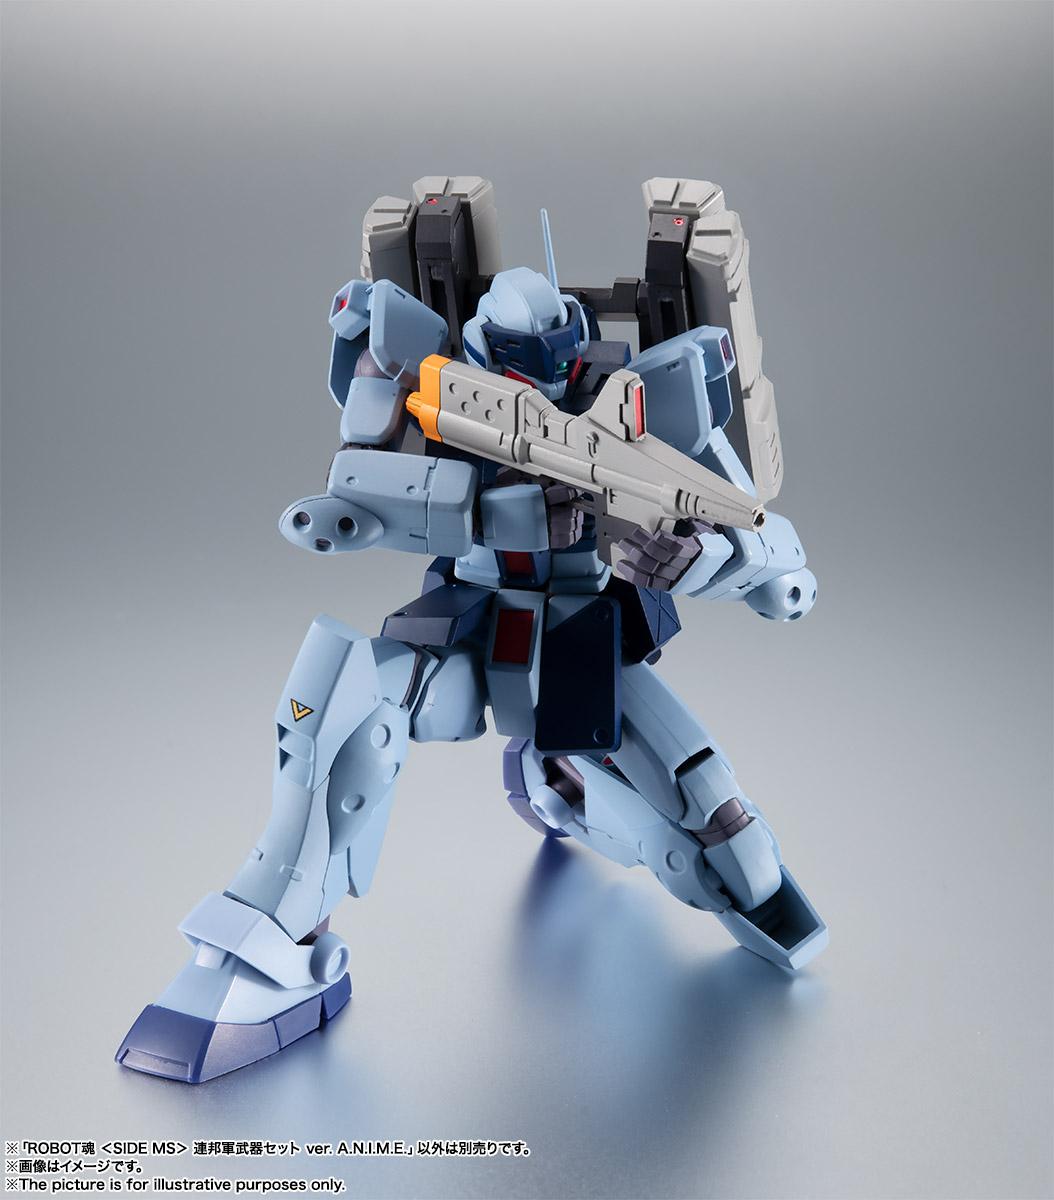 ROBOT魂〈SIDE MS〉『連邦軍武器セット ver. A.N.I.M.E.』ガンダム 完成品フィギュア-017